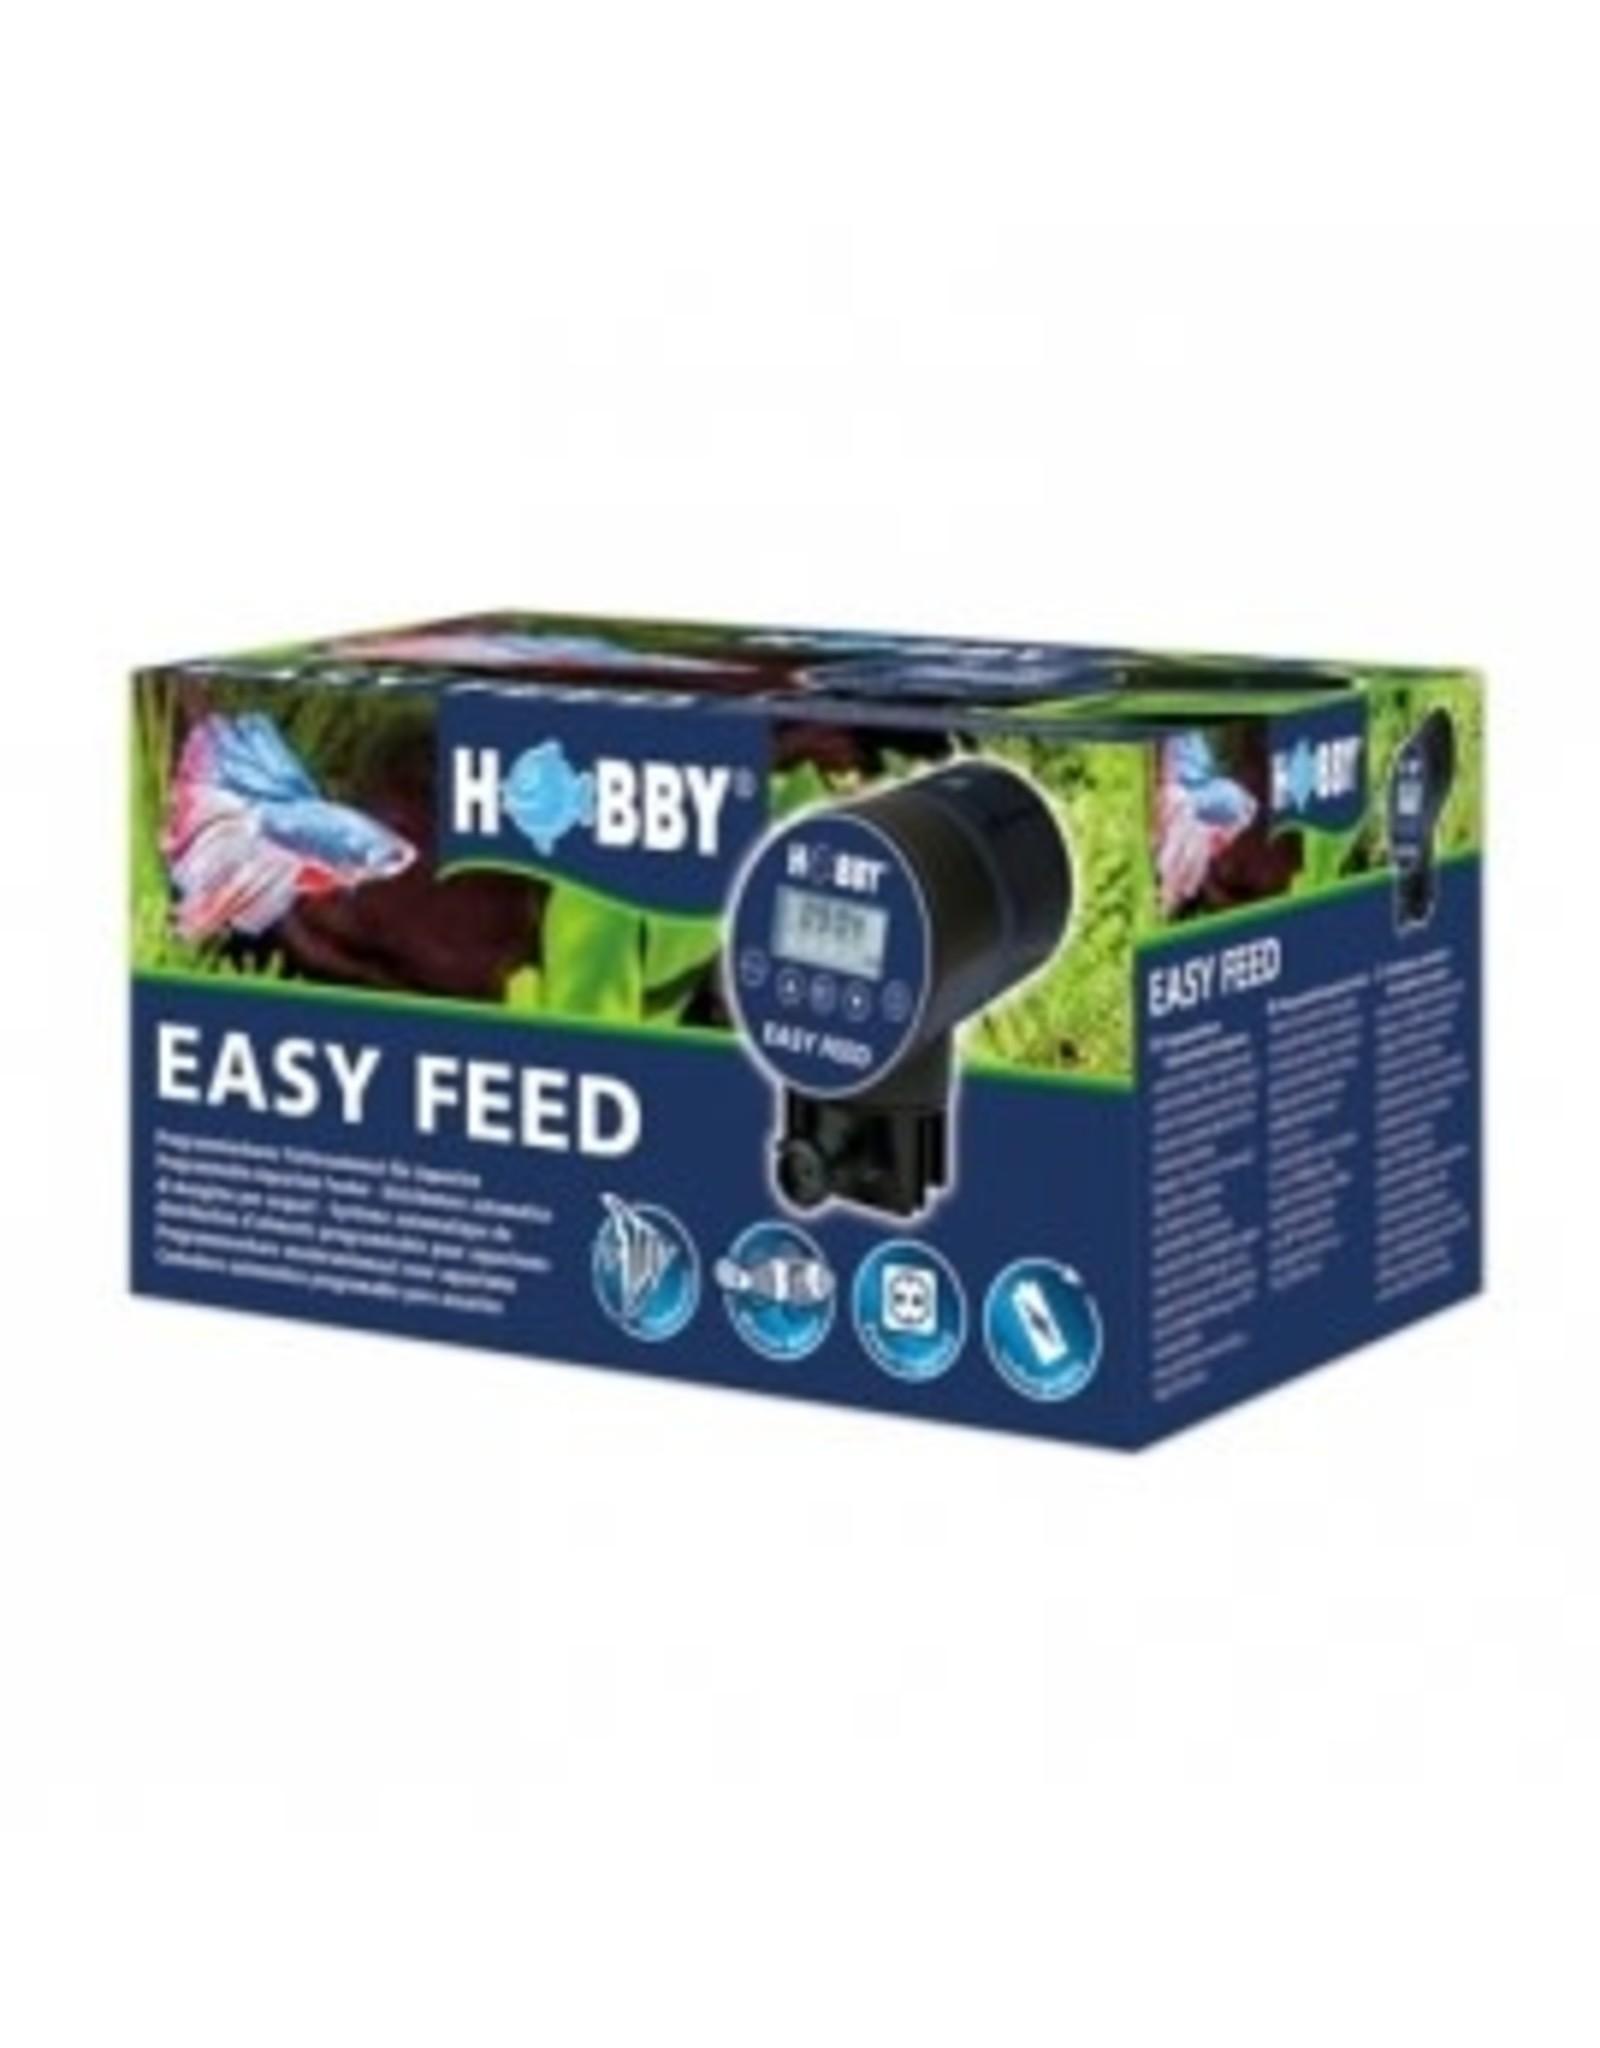 Hobby DISTRIBUTEUR HOBBY EASY FEED